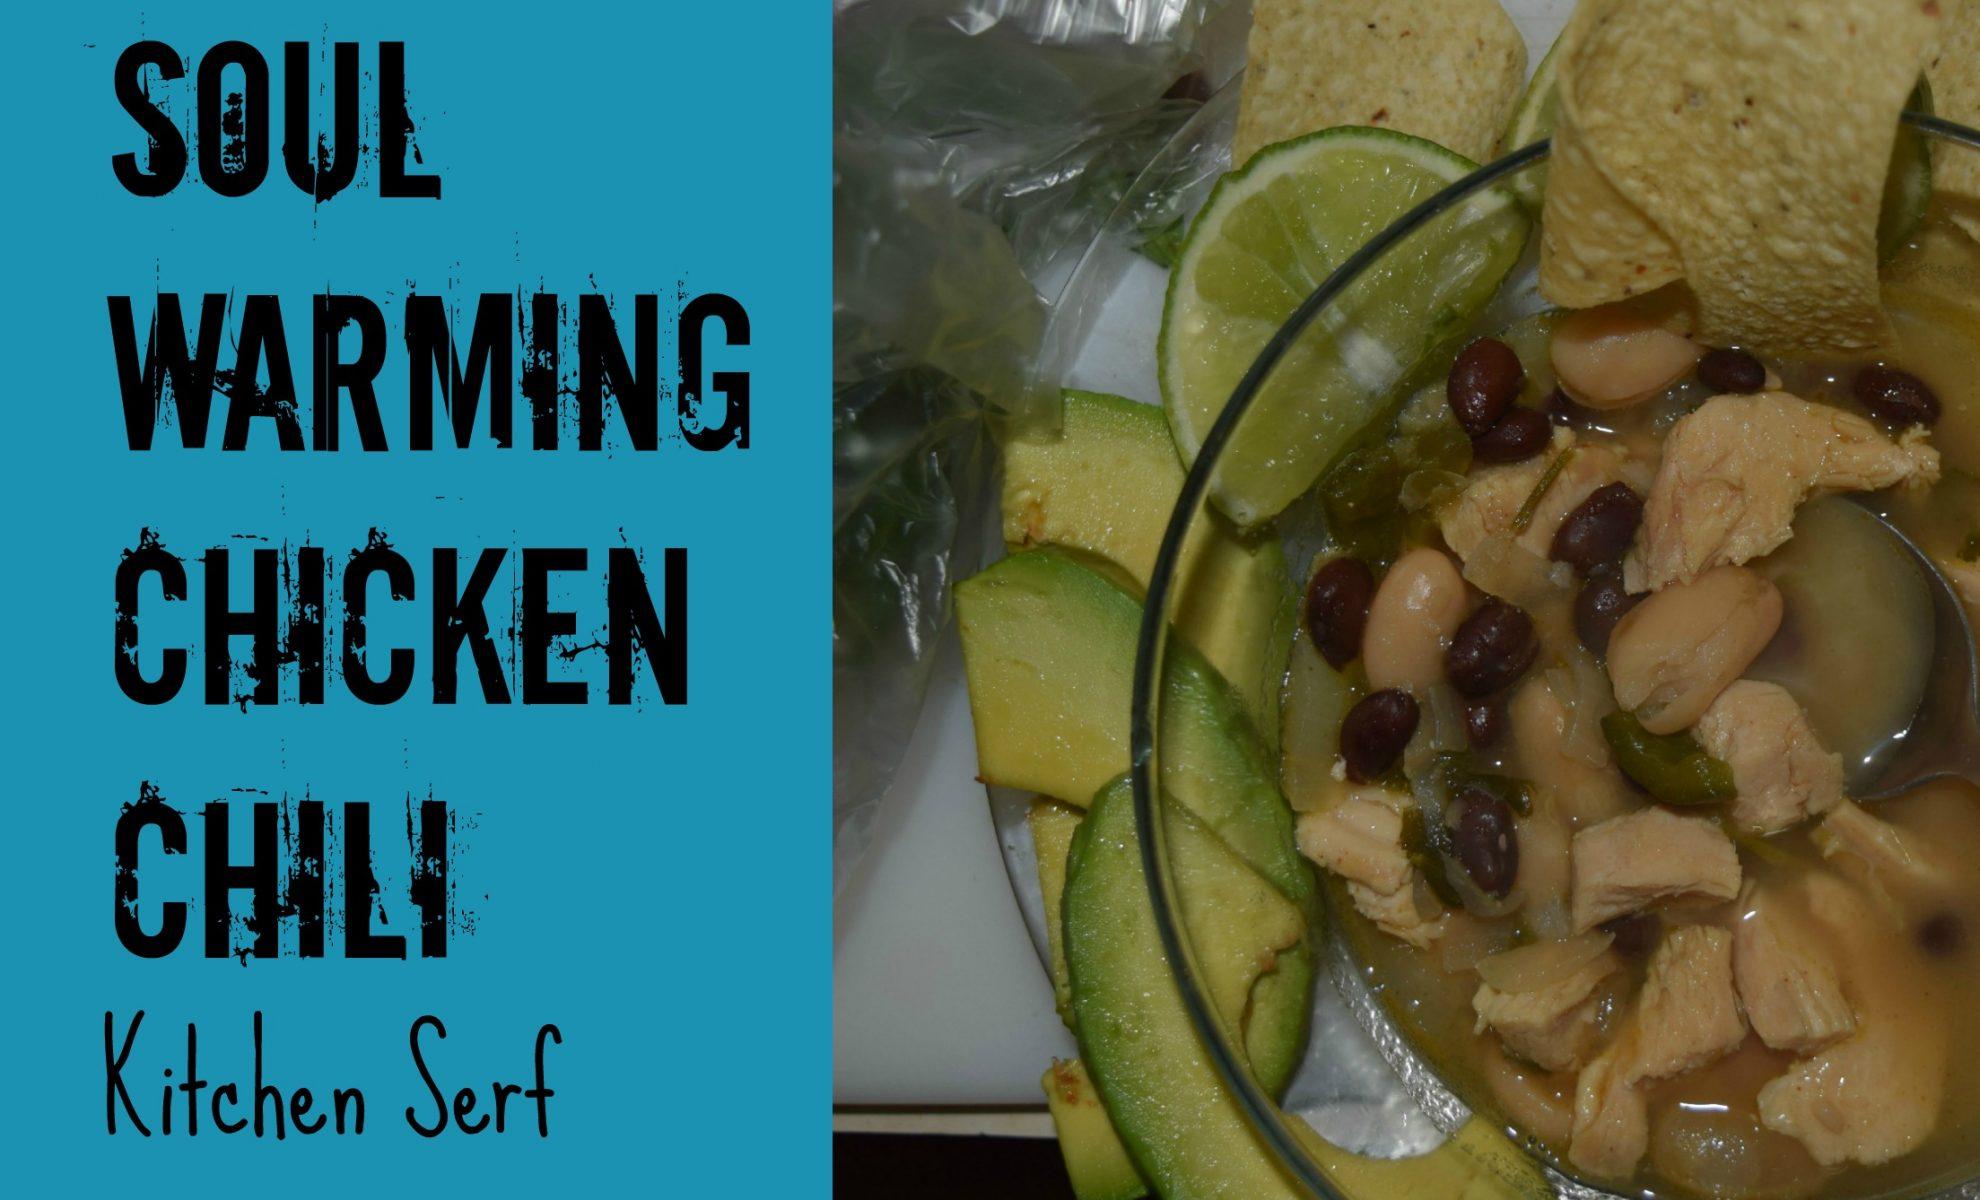 Soul Warming Chicken Chili